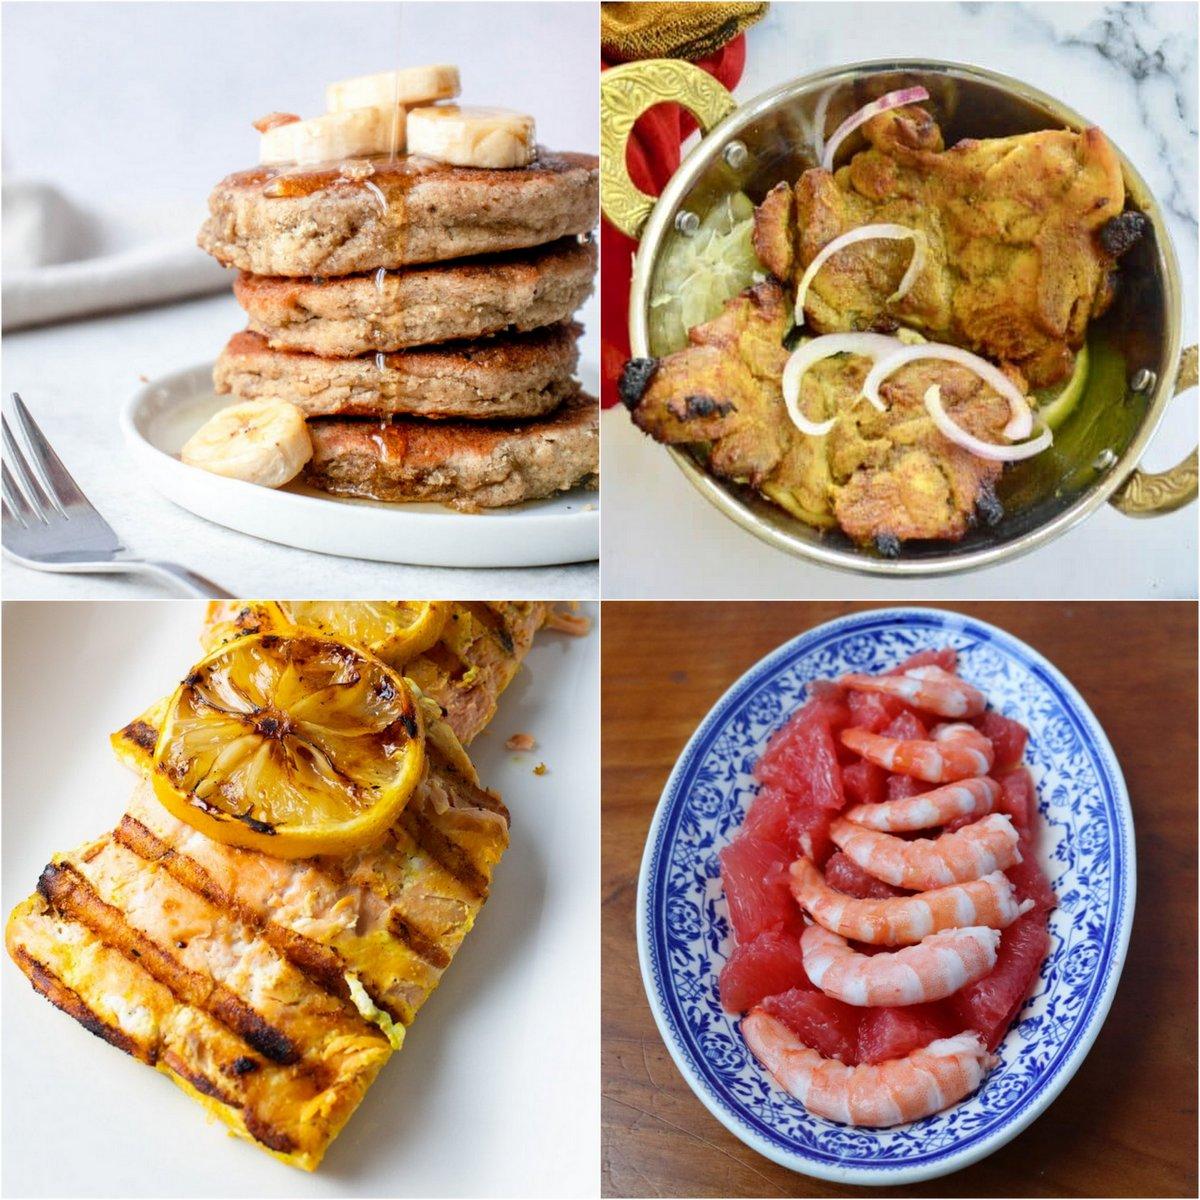 Paleo AIP Recipe Roundtable #384 | Phoenix Helix - *Featured Recipes: Banana Pancakes, Tandoori Chicken, 4-Ingredient Shrimp Salad, and Lemon Turmeric Grilled Salmon